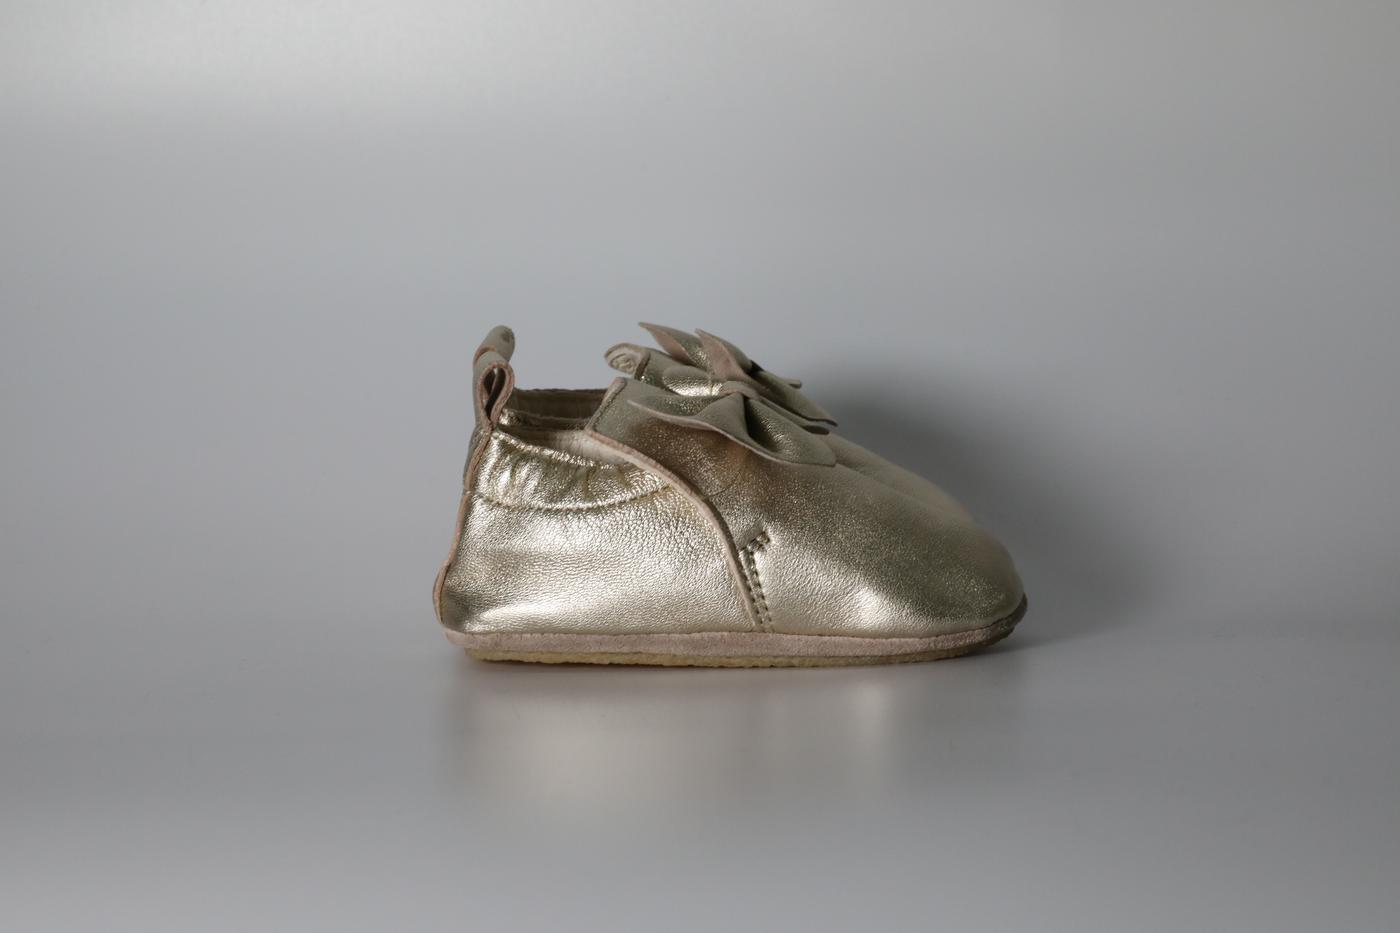 Gold Ballerina shoes